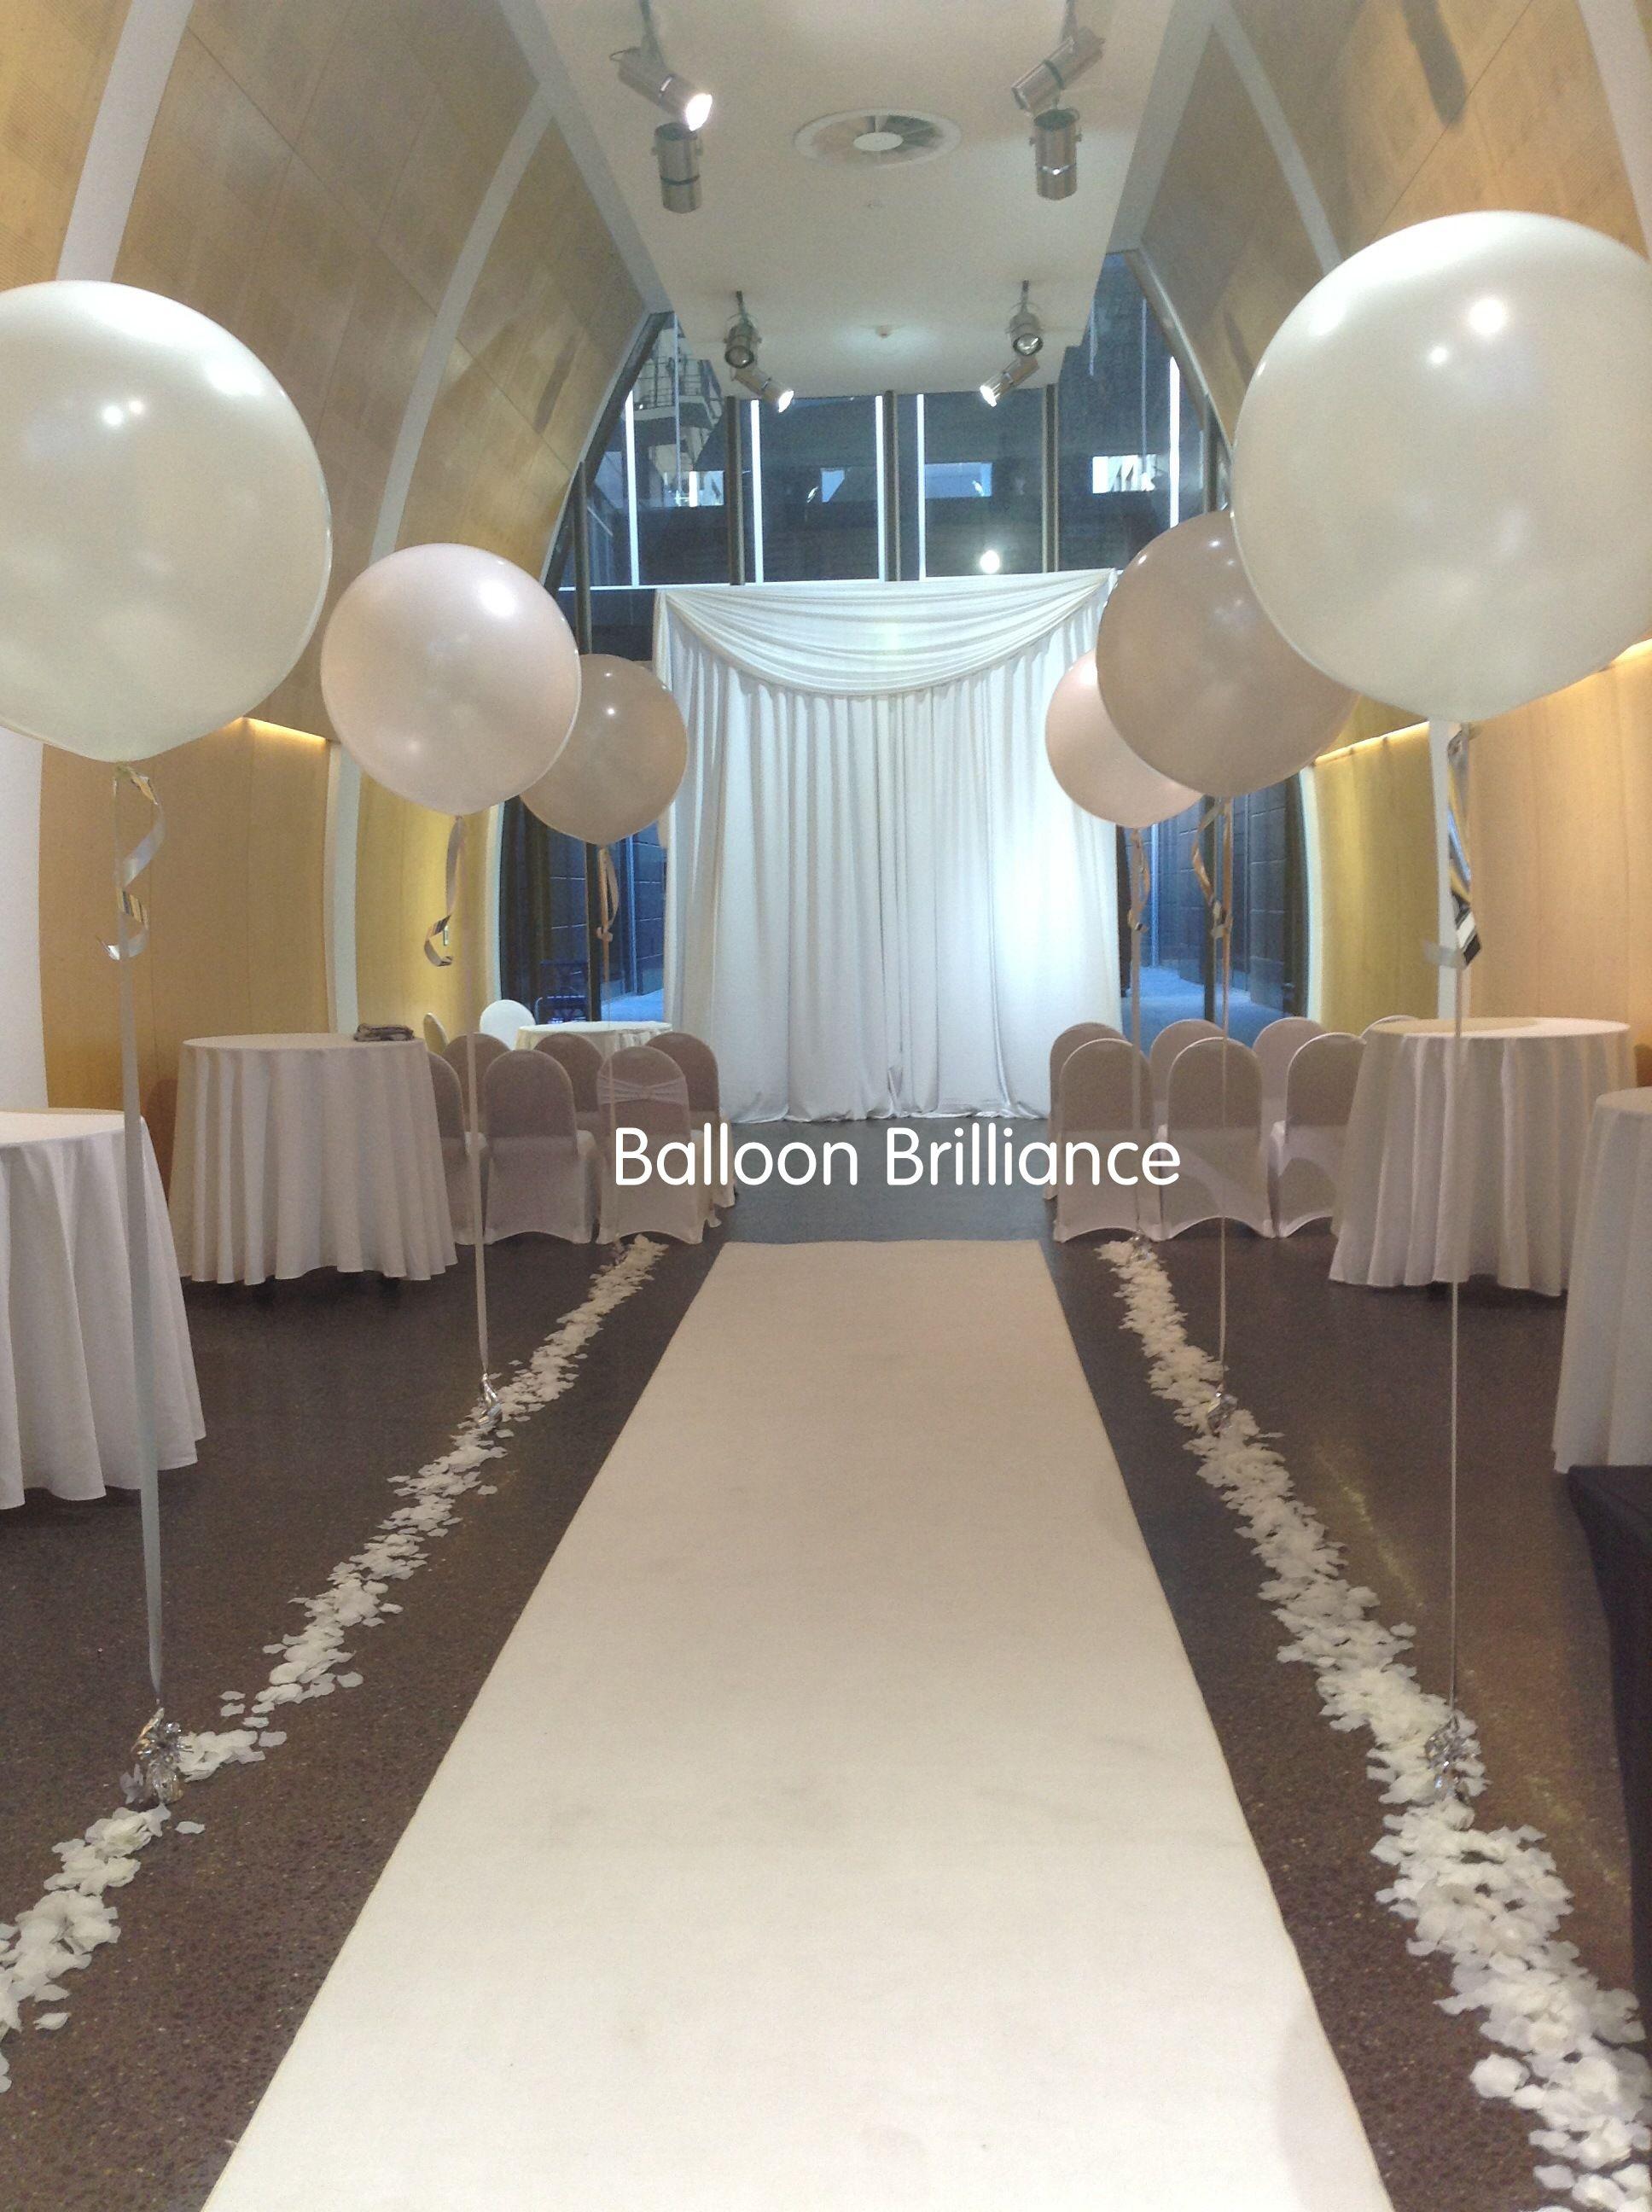 Balloons for wedding -  3foot Giant Jumbo Balloons Aisle Wedding Canberra Balloonbrilliance